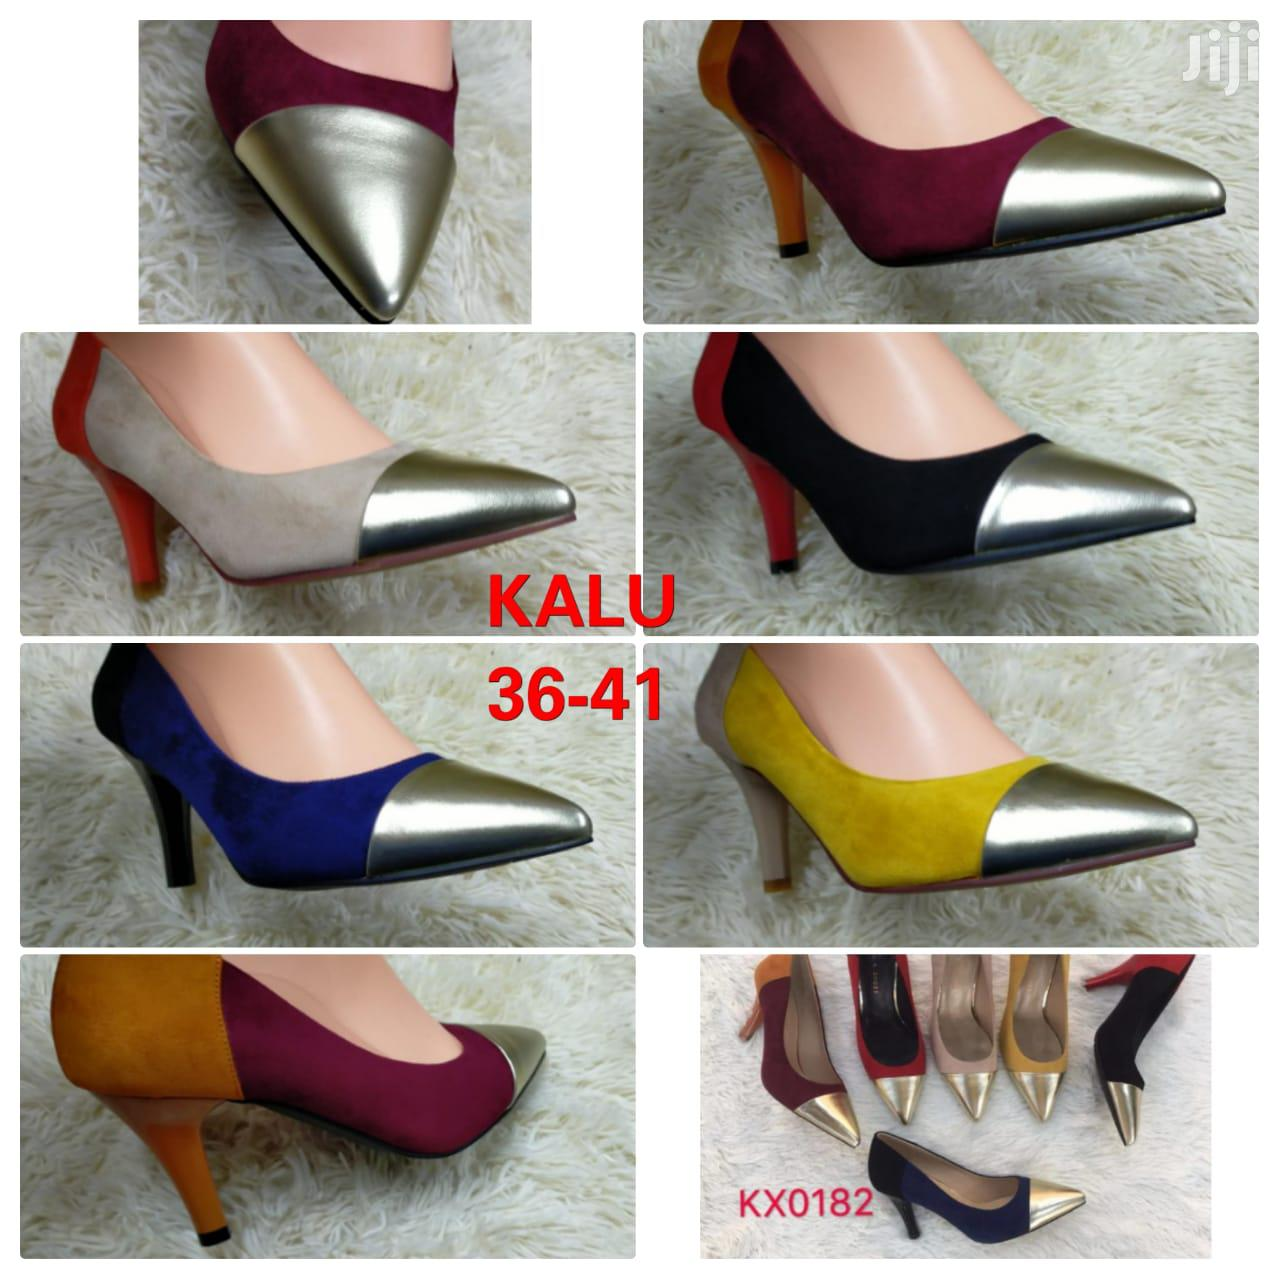 Sleek Kalu Stillettoes   Shoes for sale in South C, Nairobi, Kenya